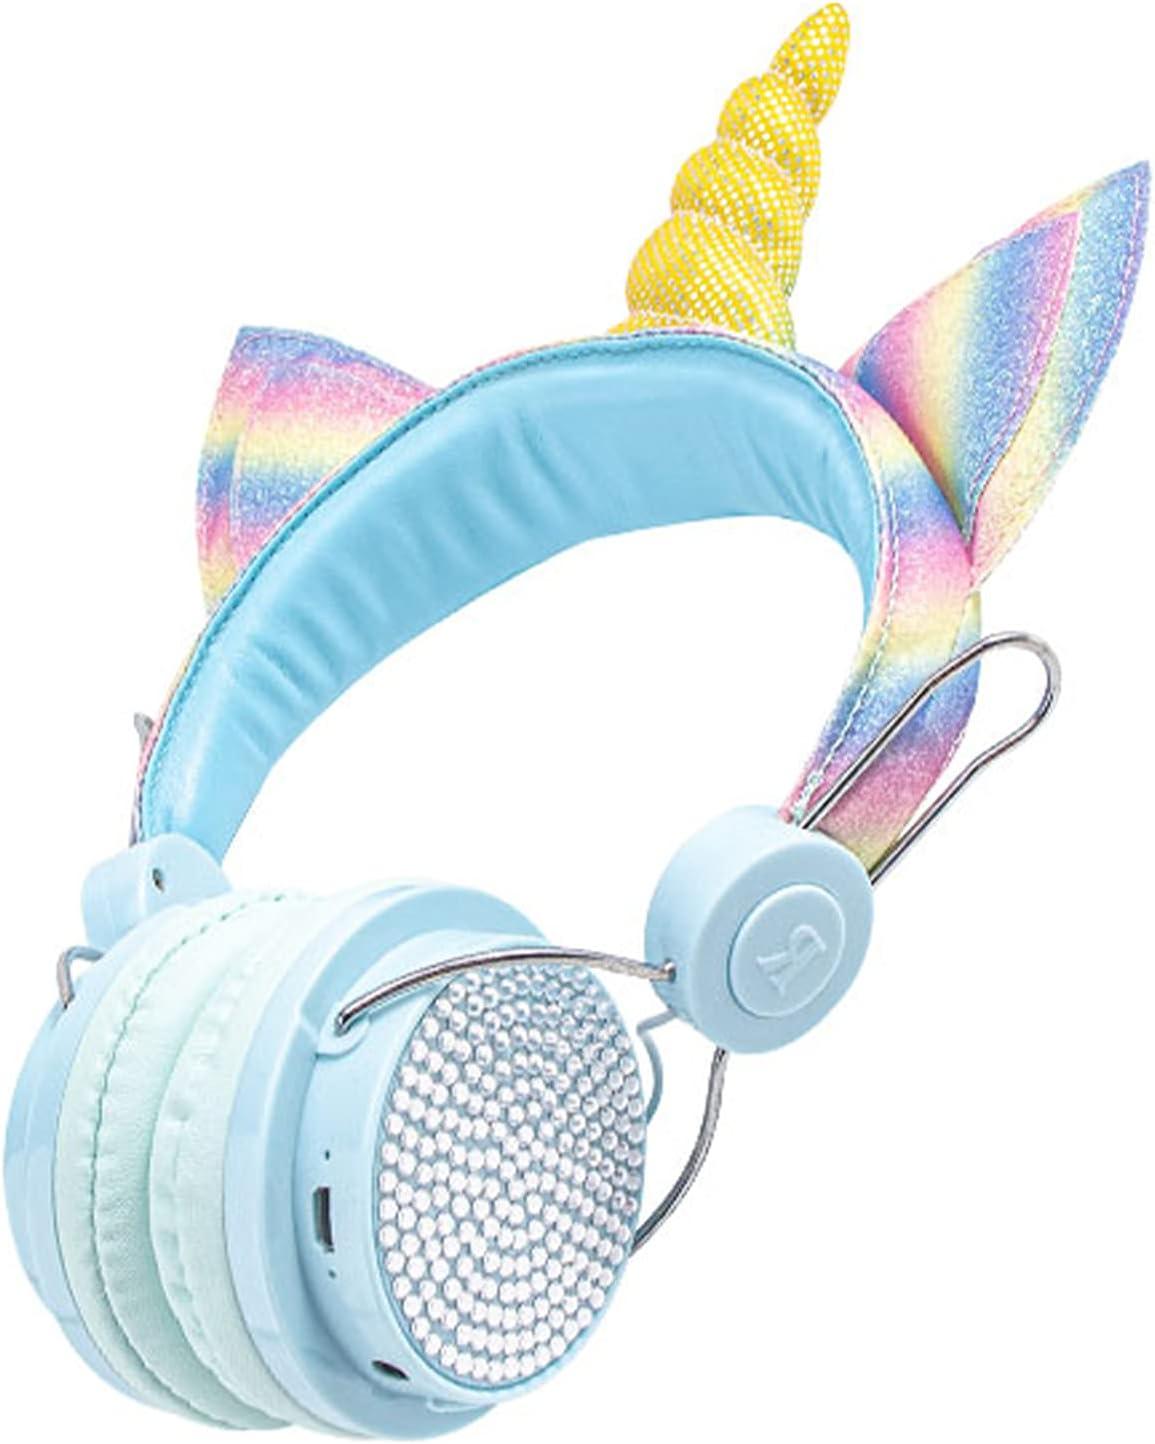 Kids Headphones Wireless Headphones for Kids Unicorn Headphones for Girls Bluetooth w/Microphone Adjustable Headband, Over On Ear Headset for School/Kindle/Tablet/PC Online Study (Blue)